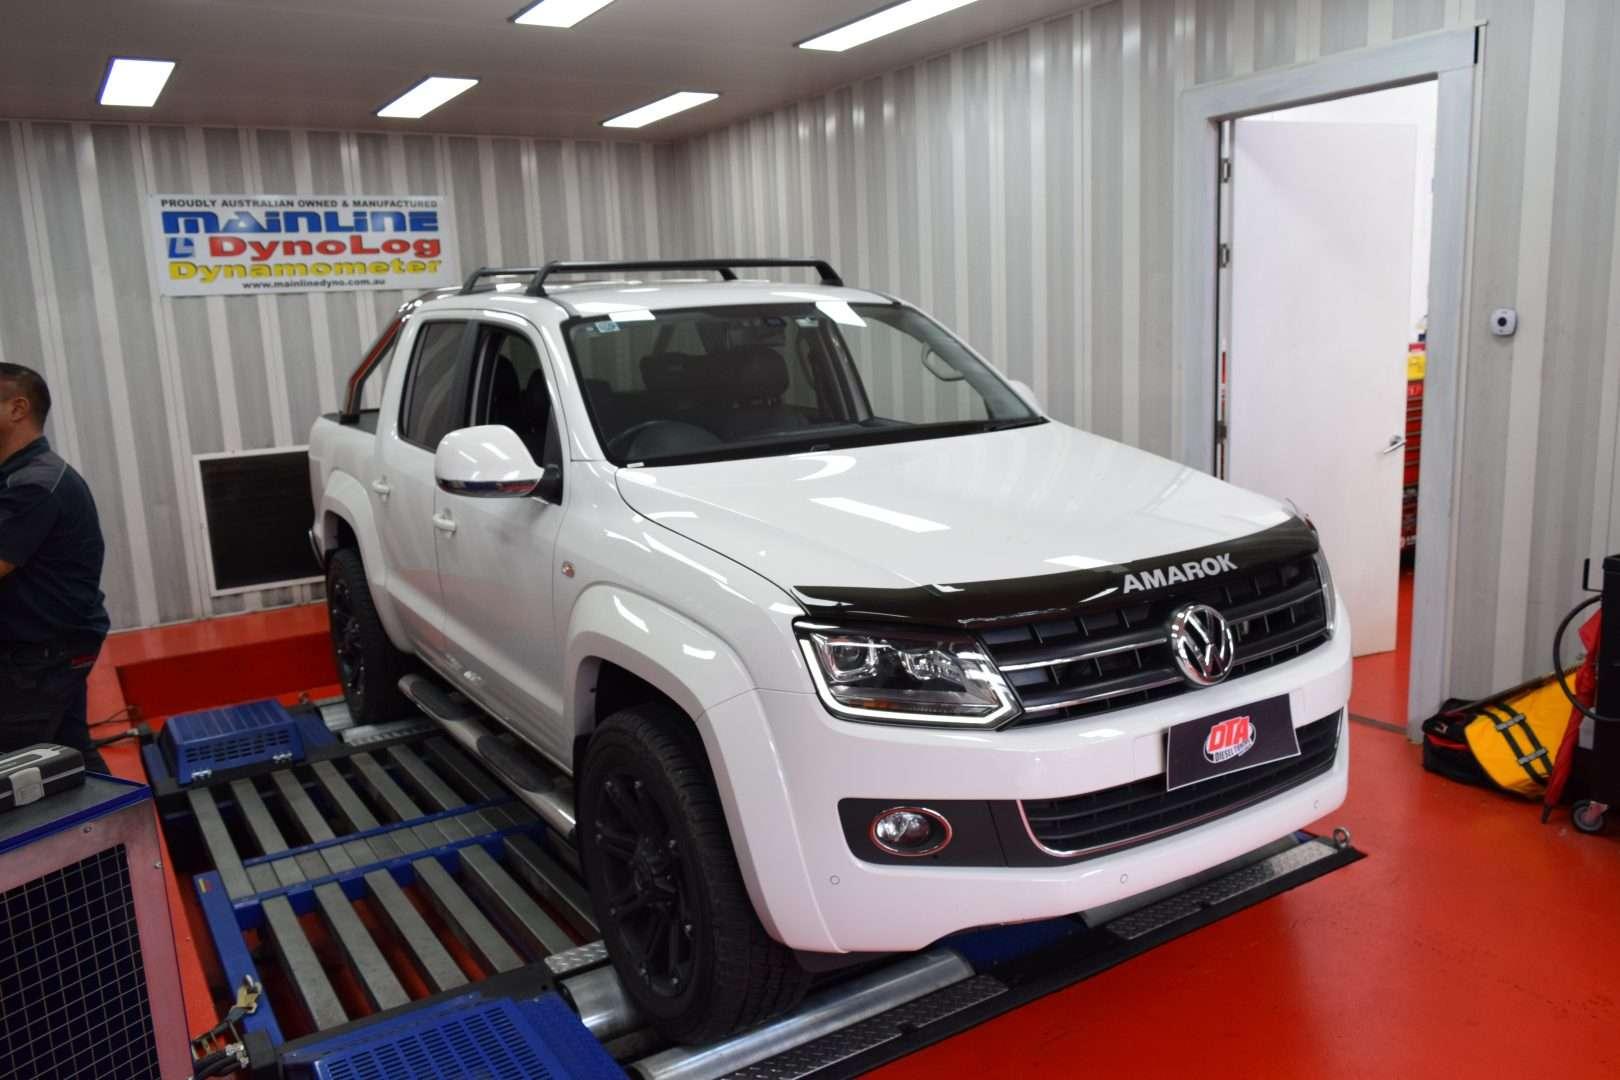 volkswagen amarok tdi400 2 0l 132 kw ecu remap diesel. Black Bedroom Furniture Sets. Home Design Ideas